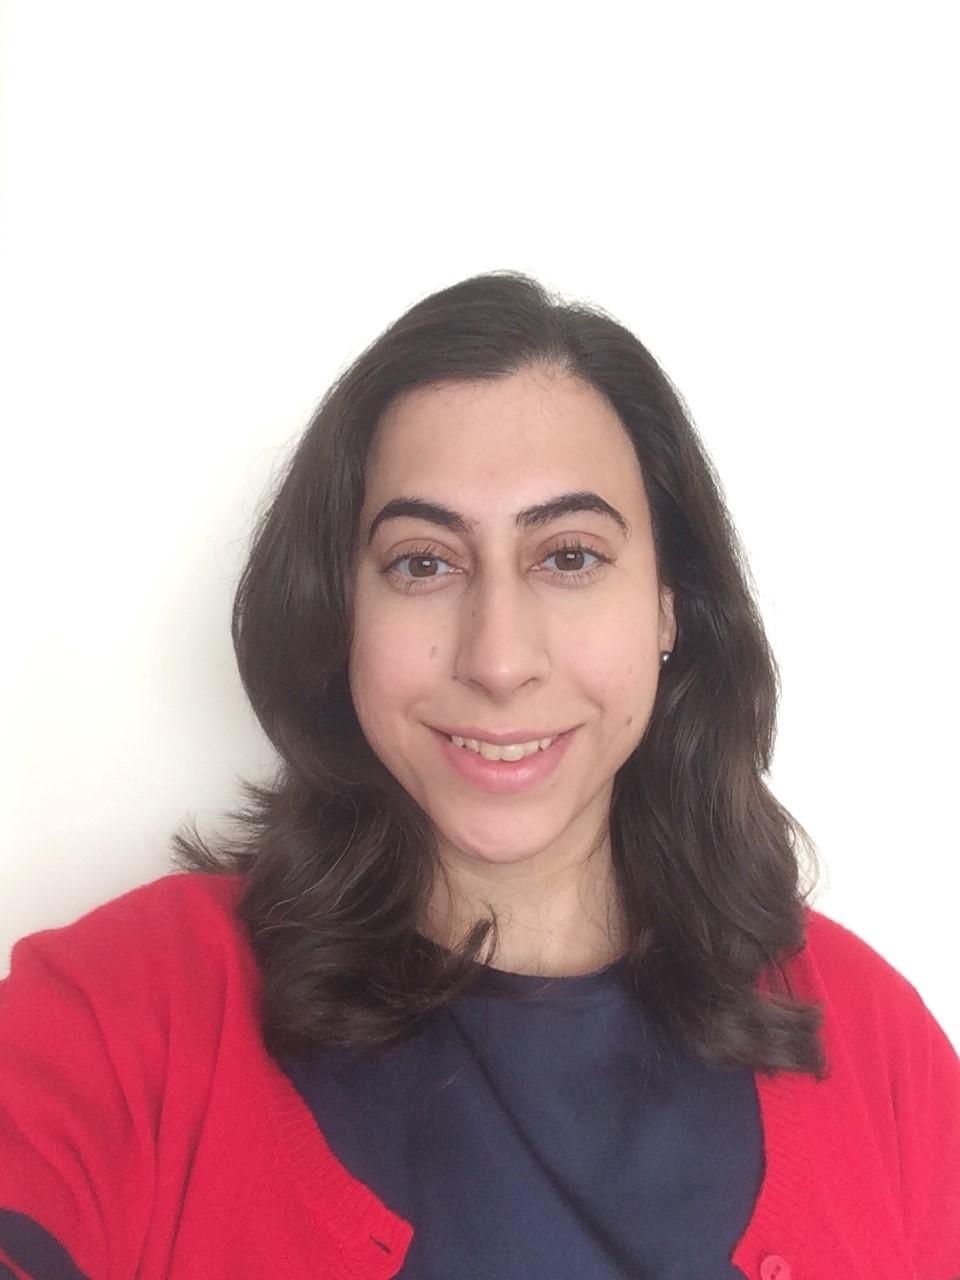 Miriam Bashir